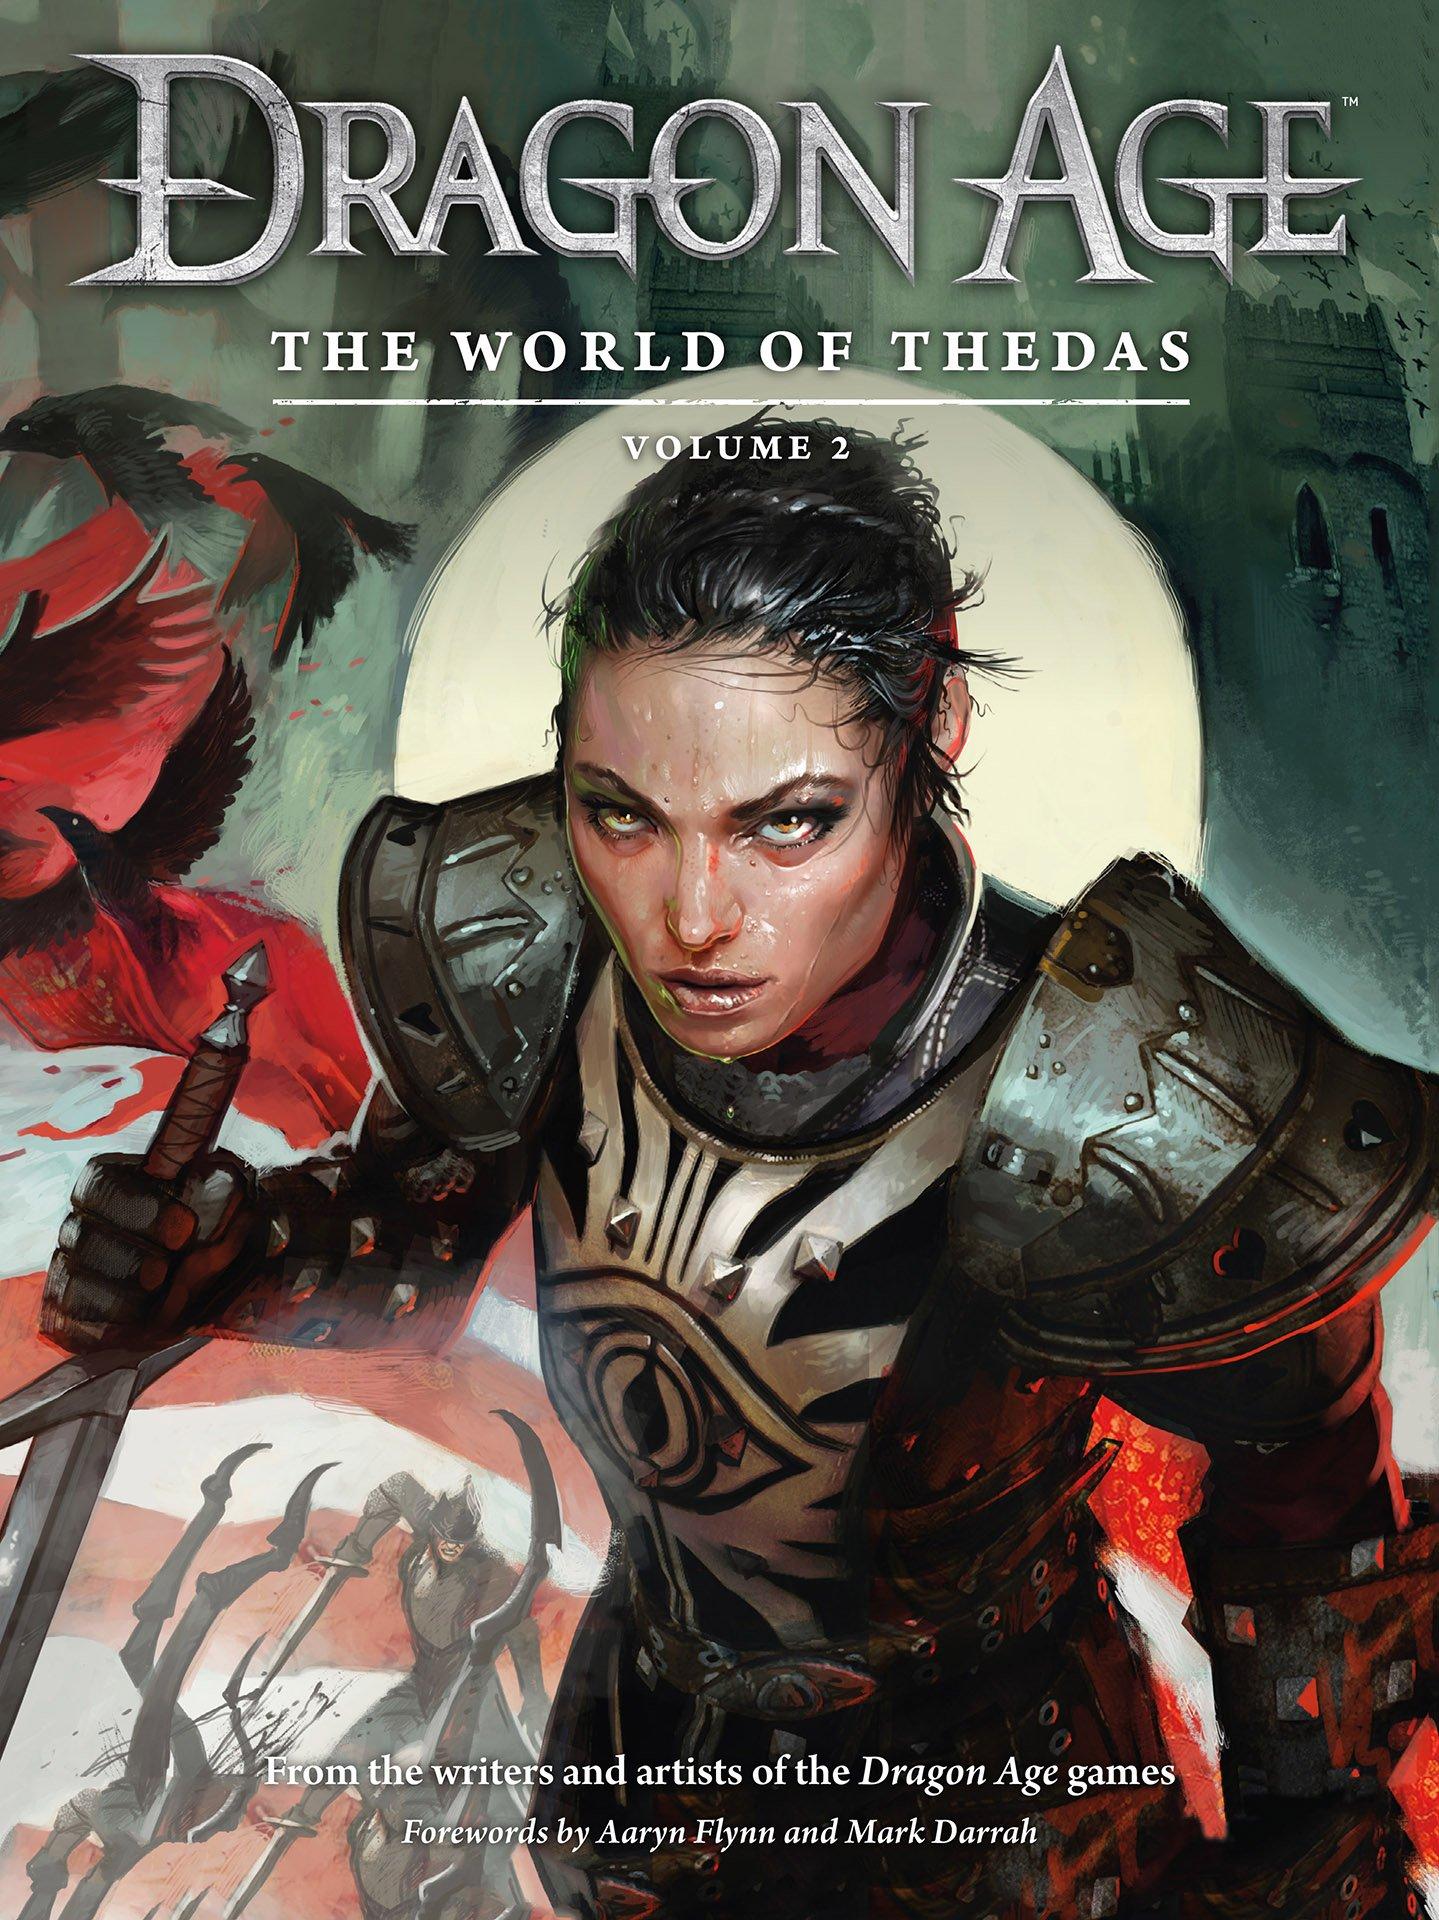 Dragon Age - The World of Thedas Volume 2